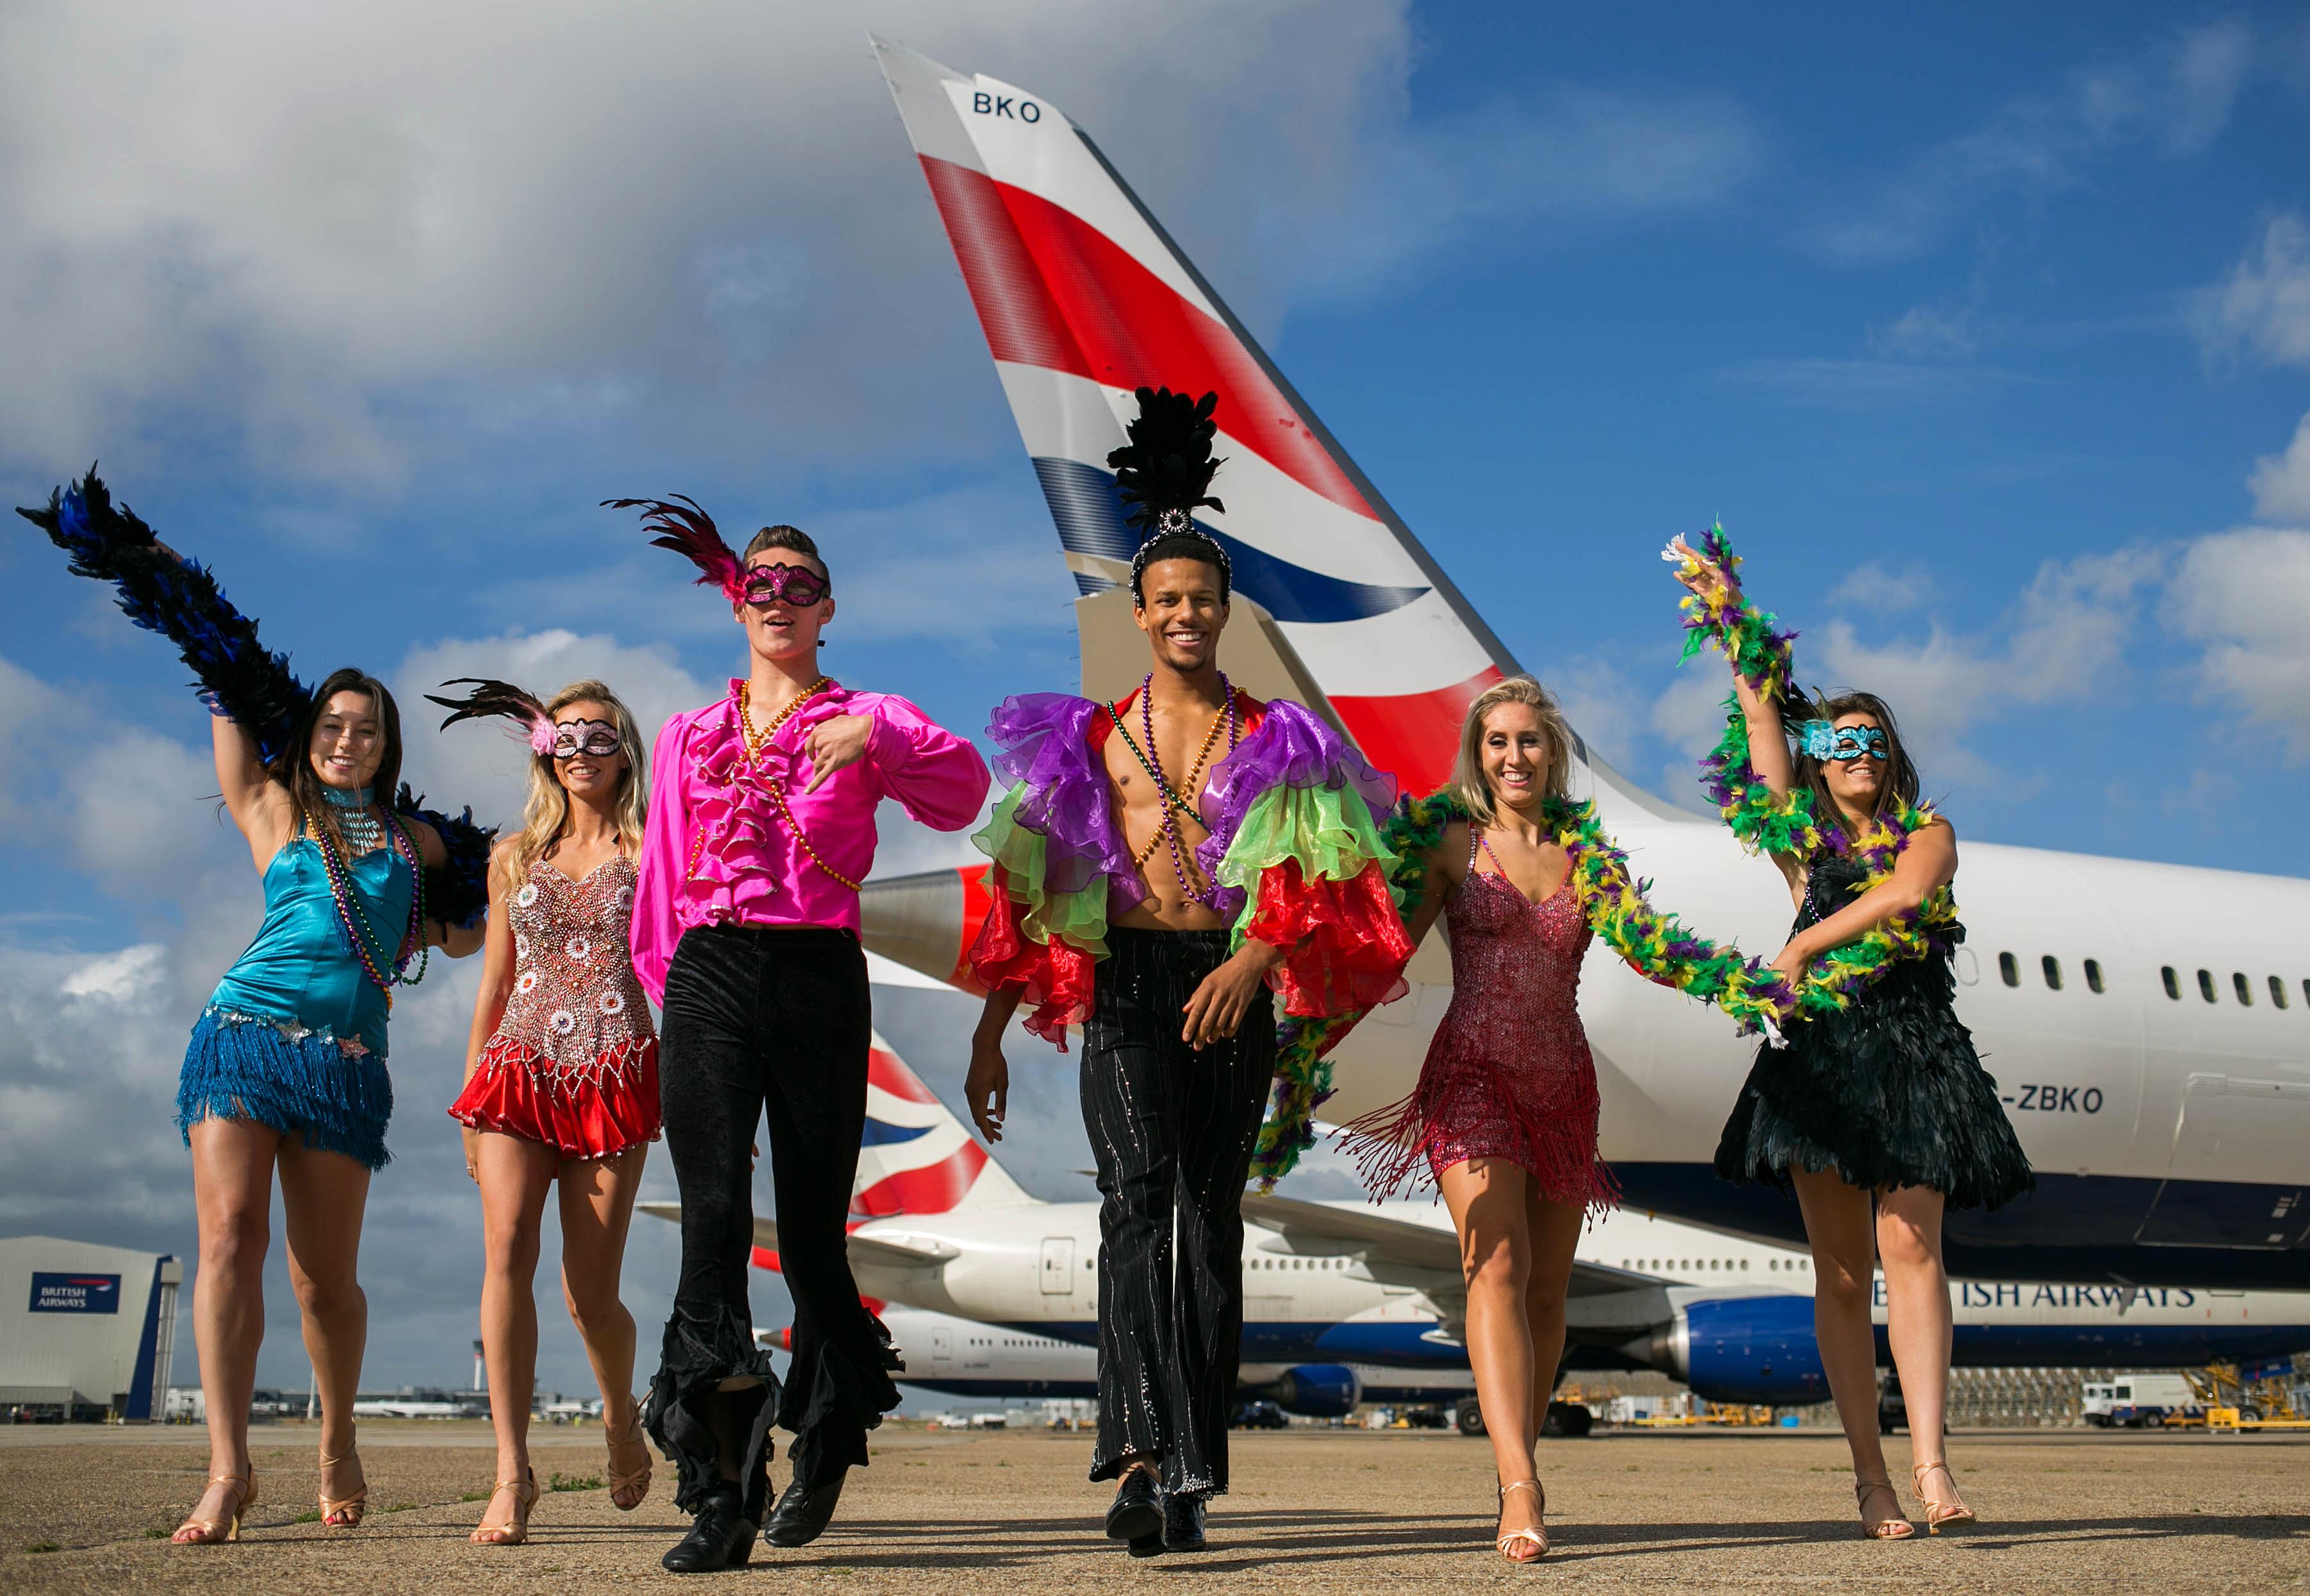 Præsentation af den nye British Airways-rute til New Orleans. (Foto: British Airways)